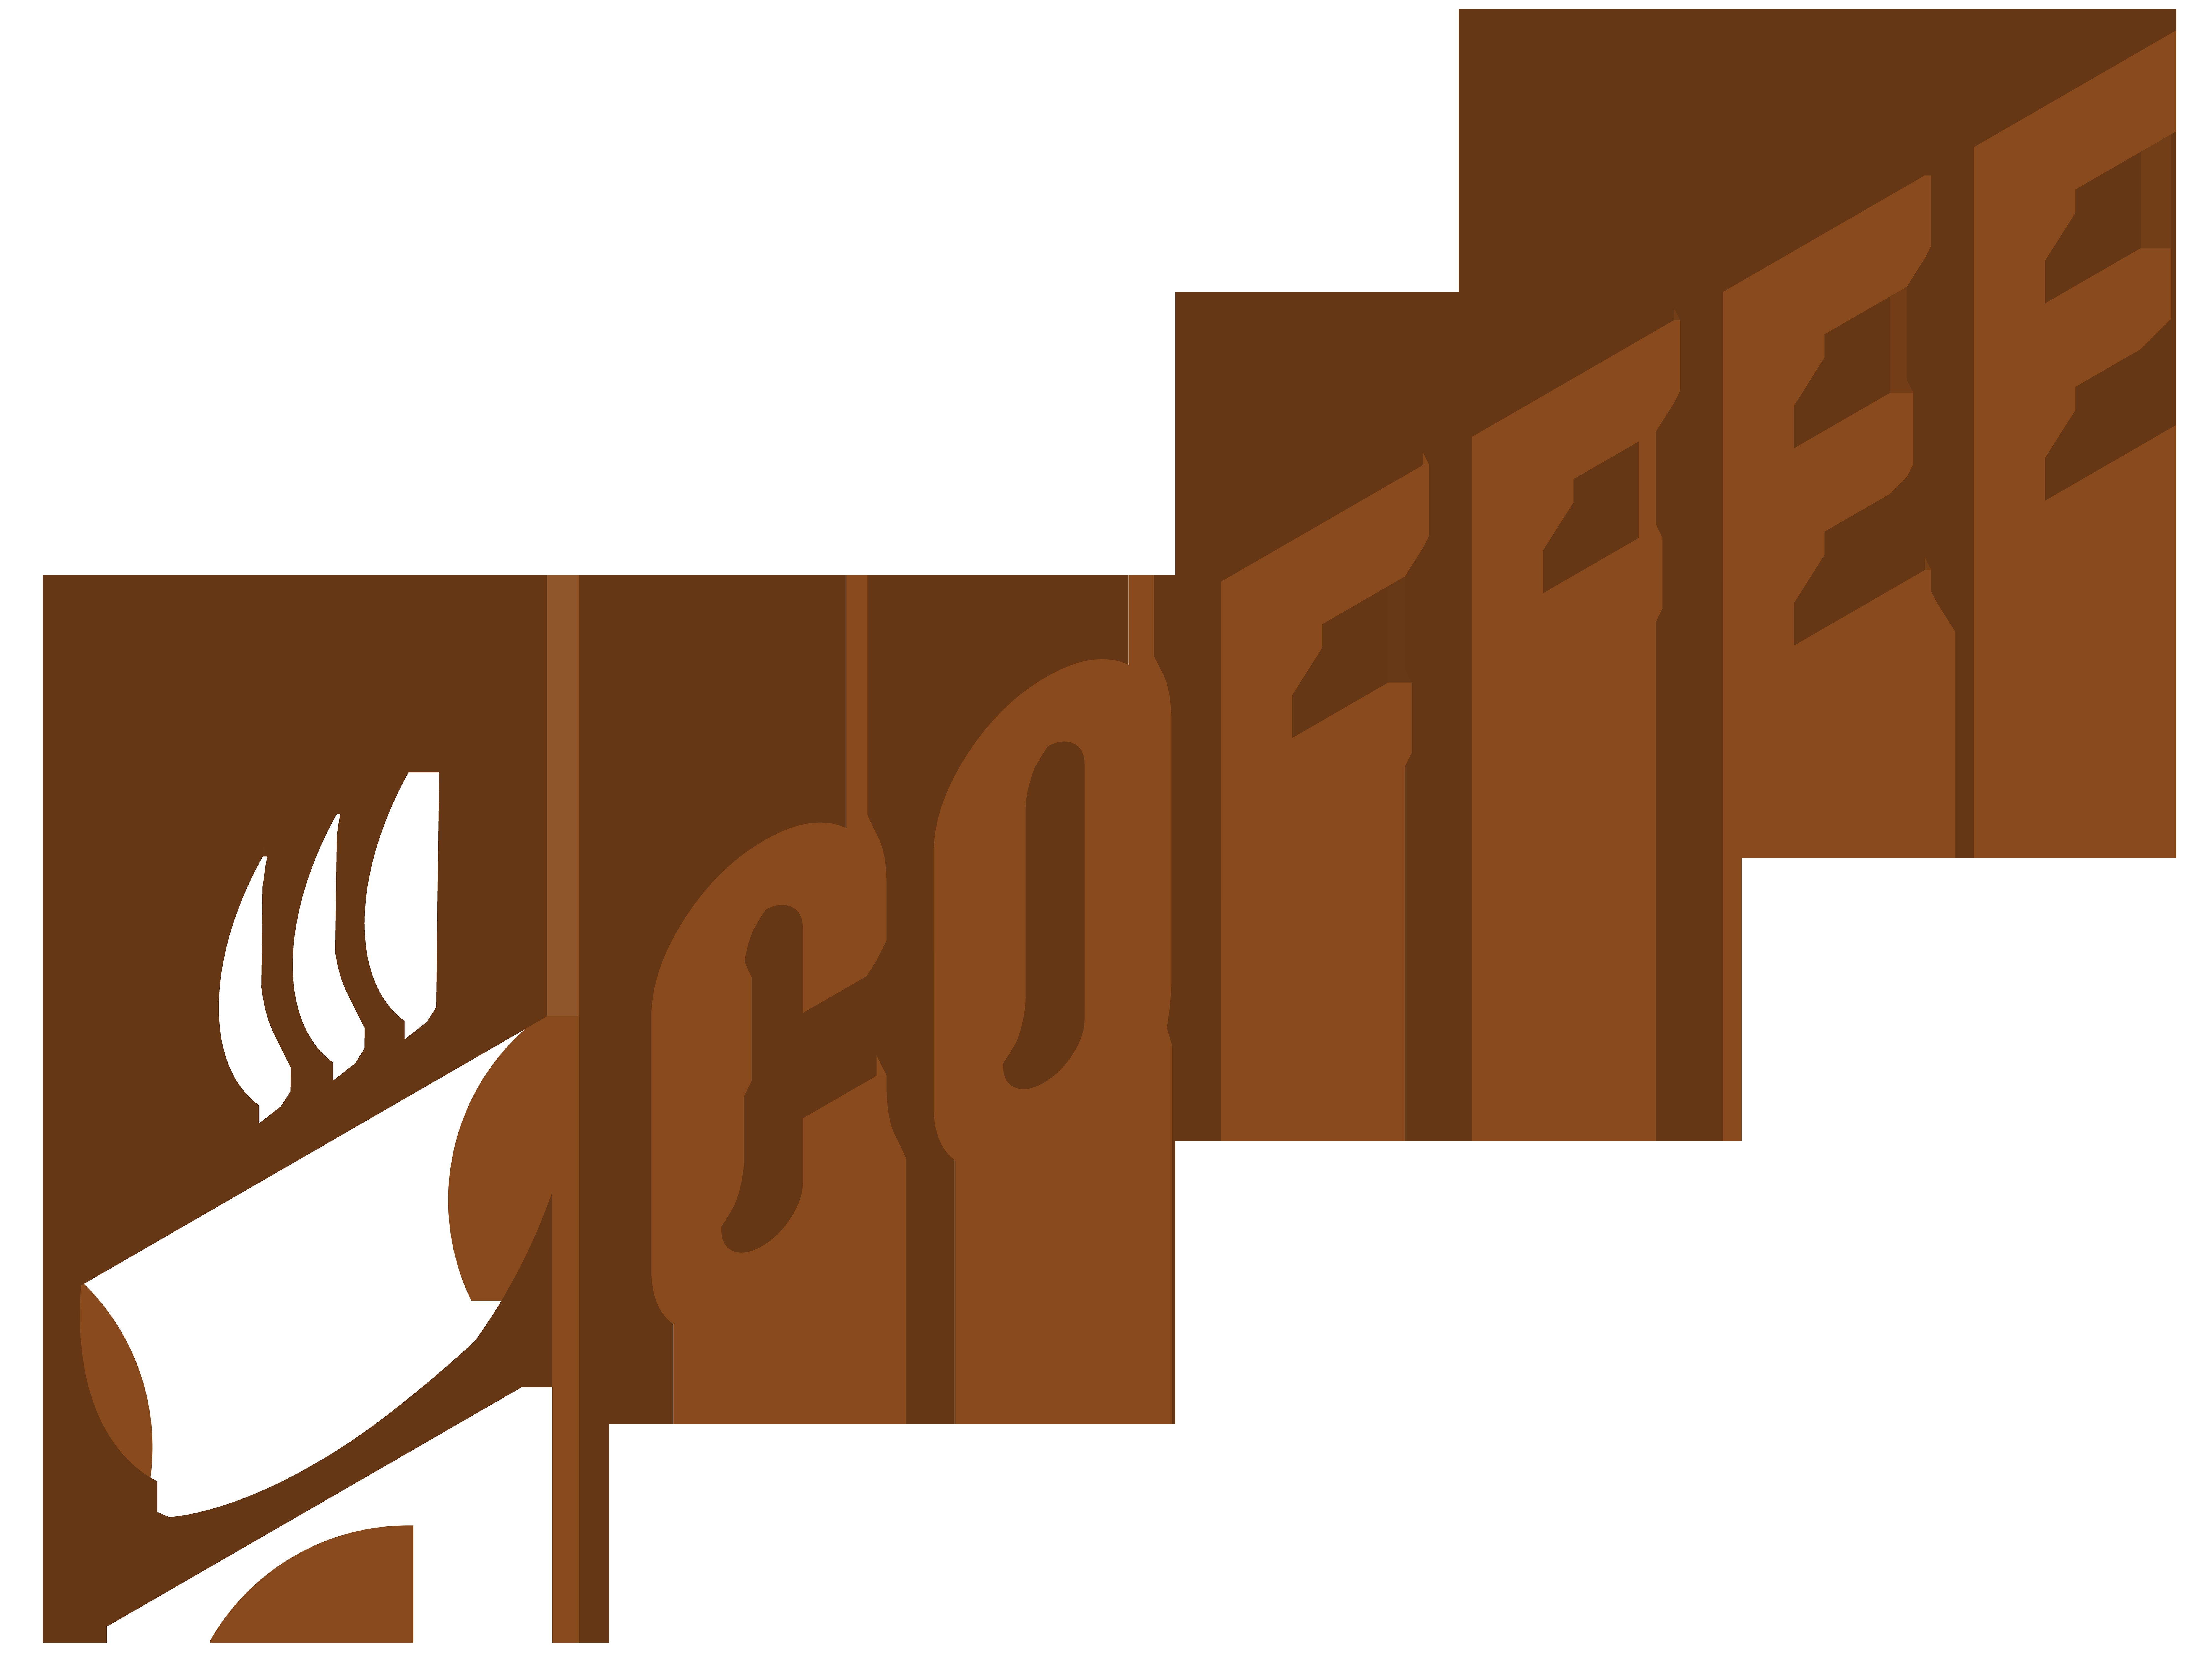 Coffee Logo Transparent Clip Art Image.